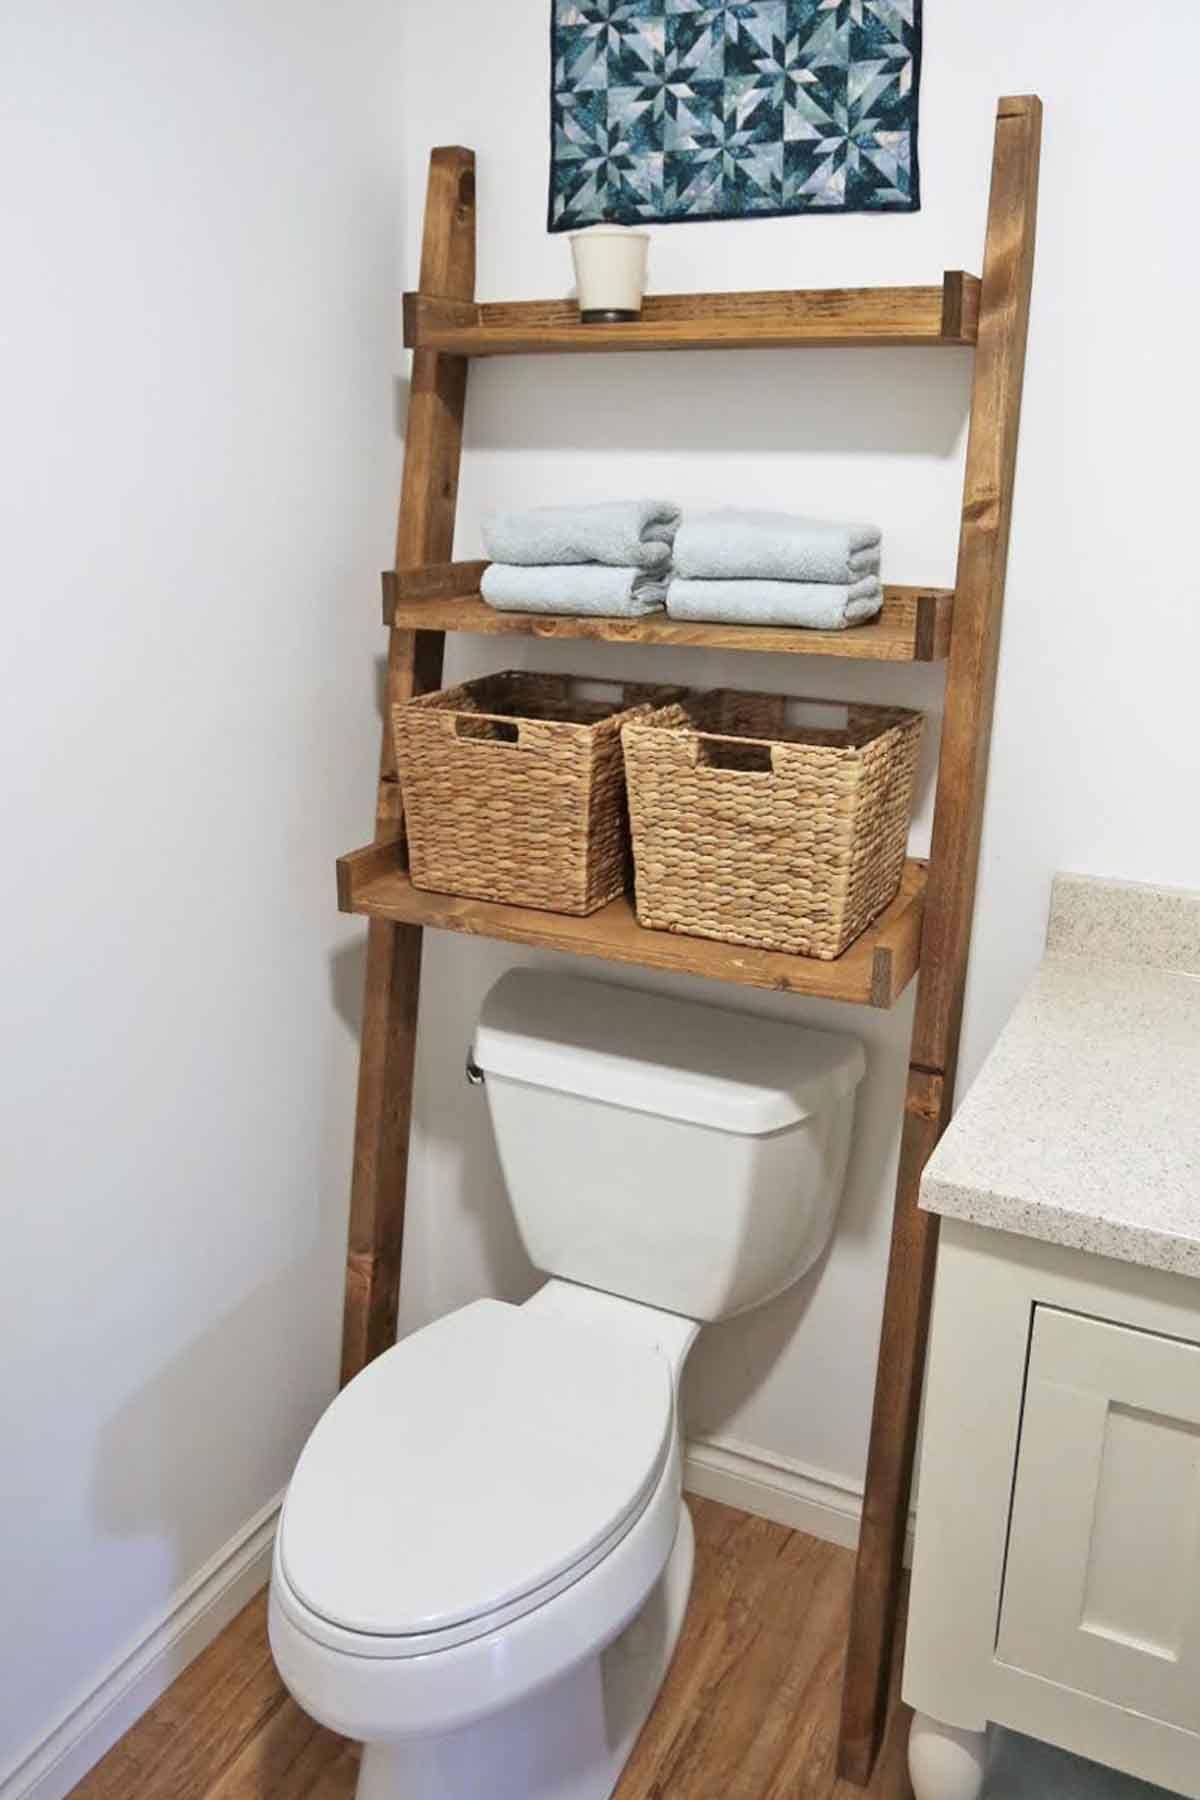 20 Best Bathroom Organization Ideas How To Organize Your Bathroom